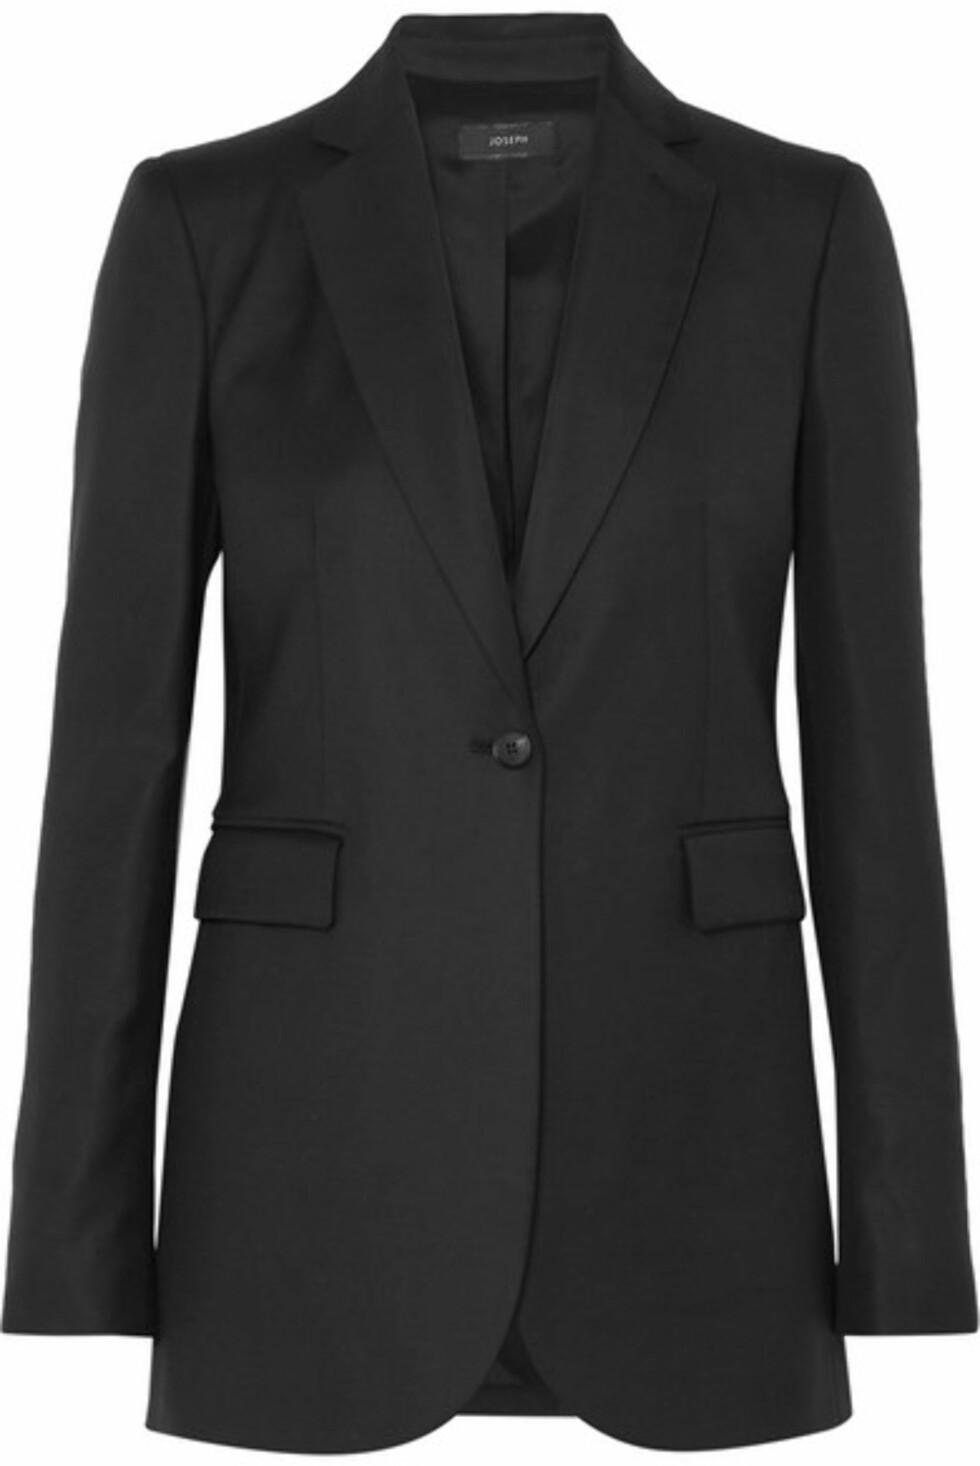 Blazer fra Joseph |3400,-| https://www.net-a-porter.com/no/en/product/996315/joseph/laurent-wool-twill-blazer